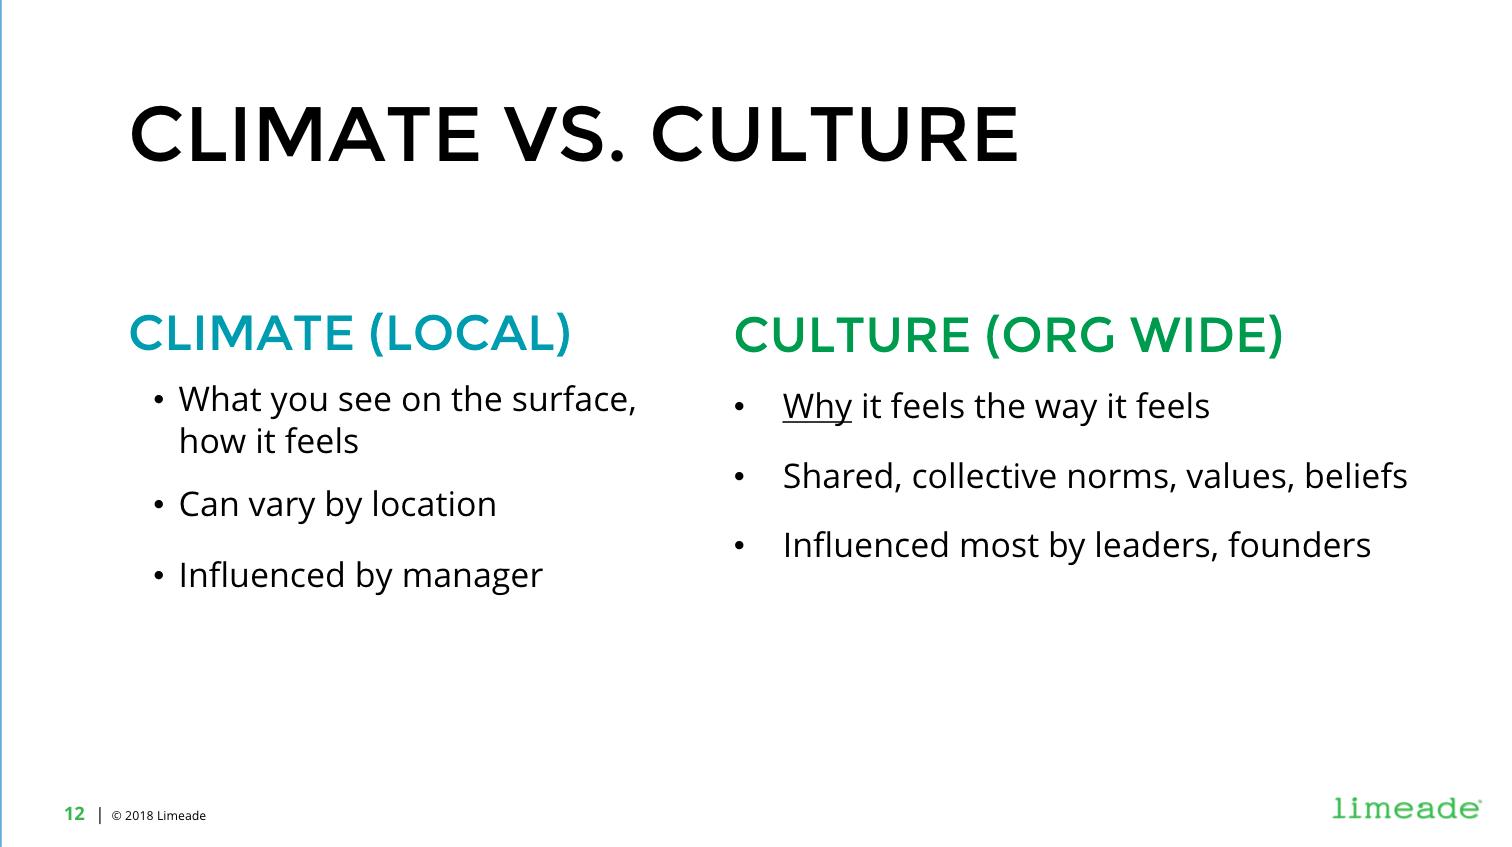 Climate vs. Culture